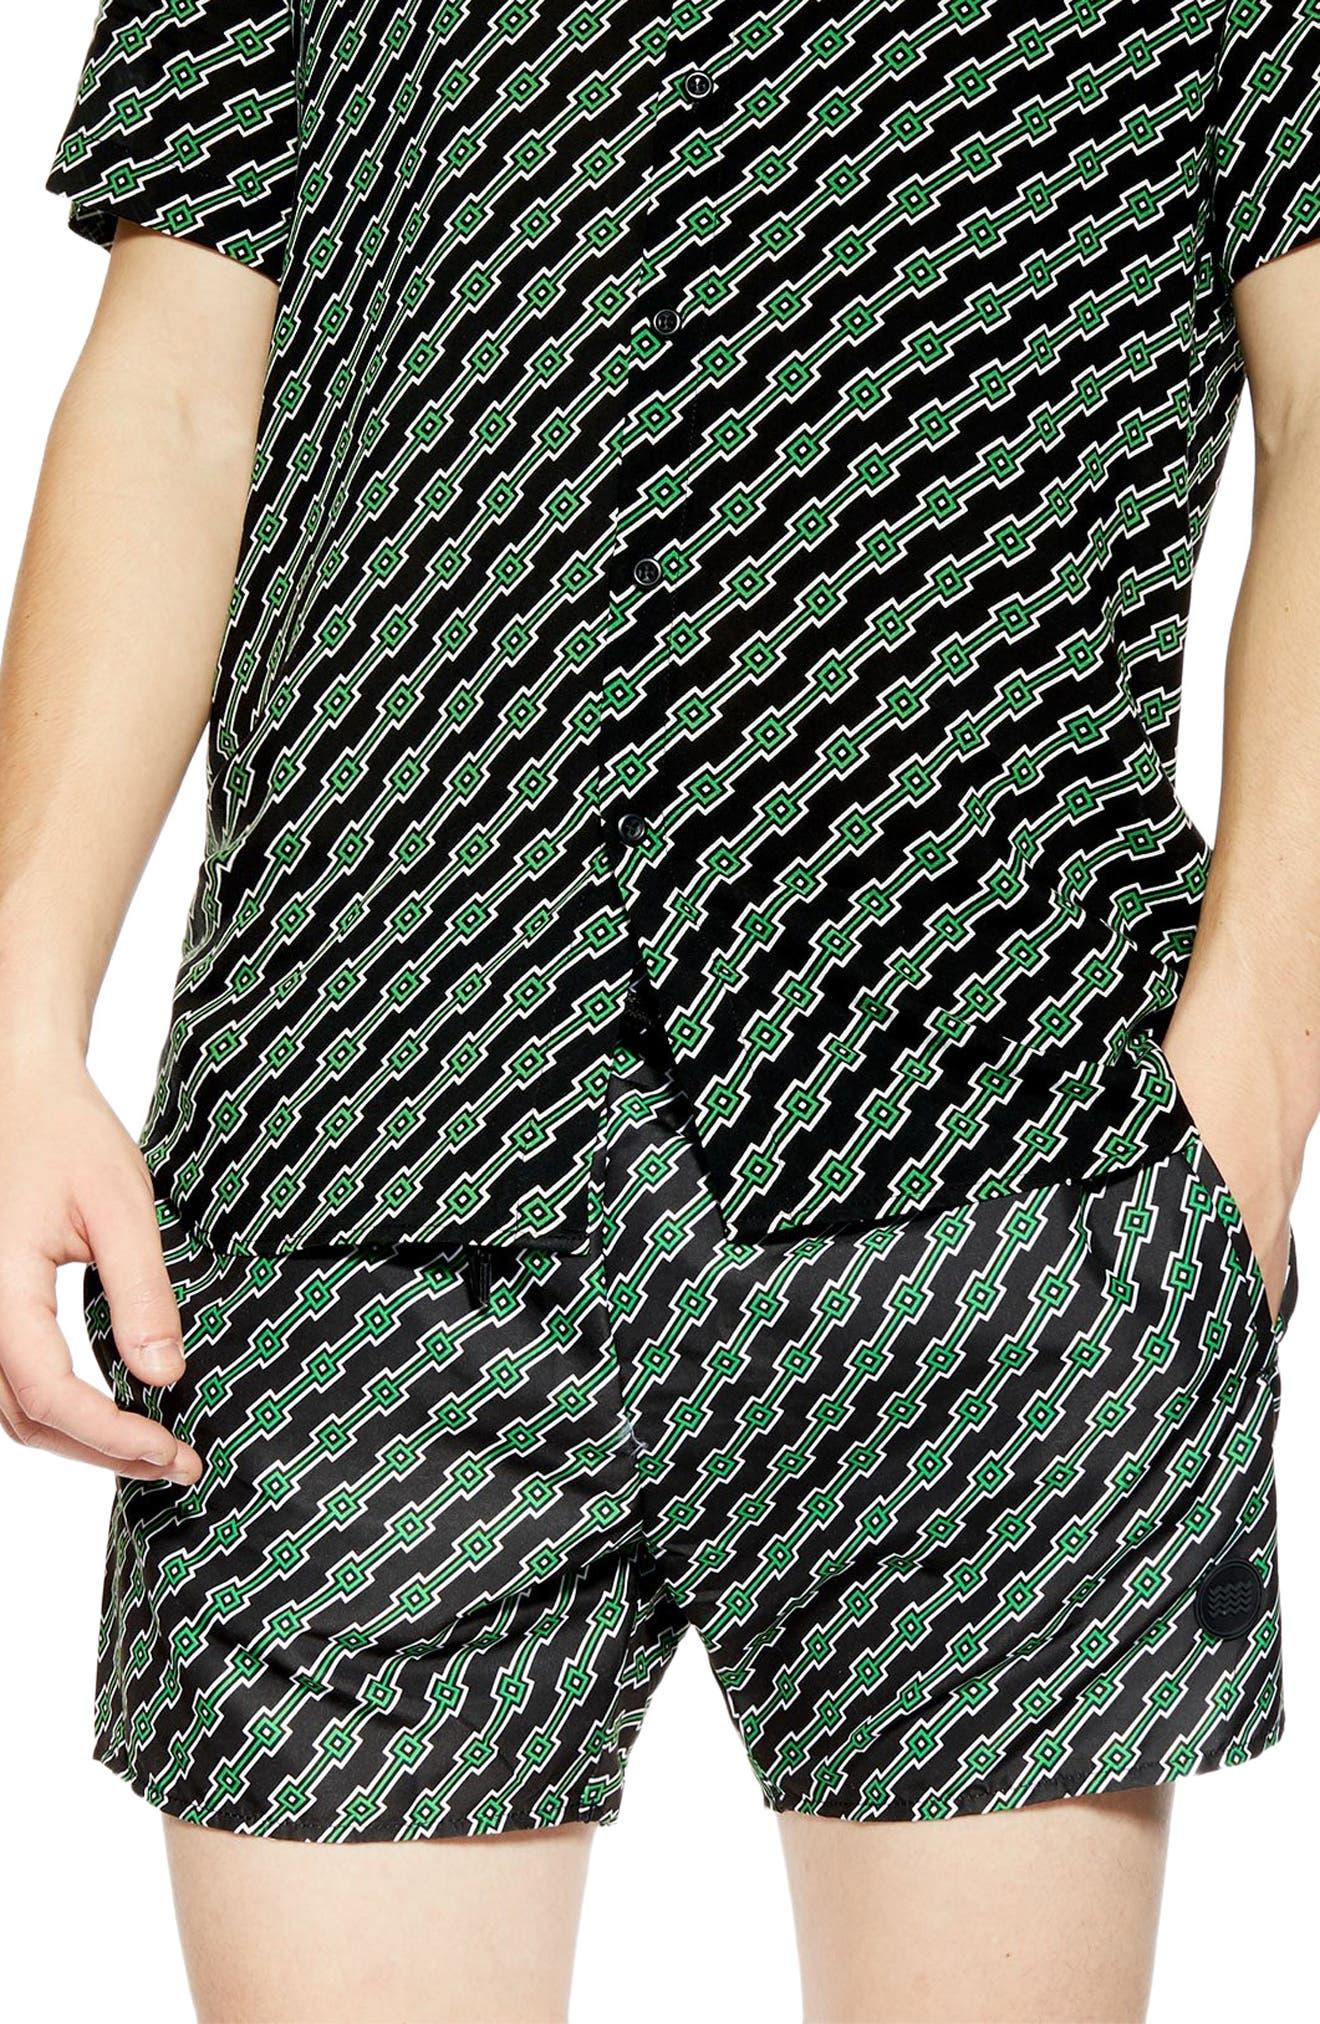 Topman Geo Print Co-Ord Swim Trunks, Black